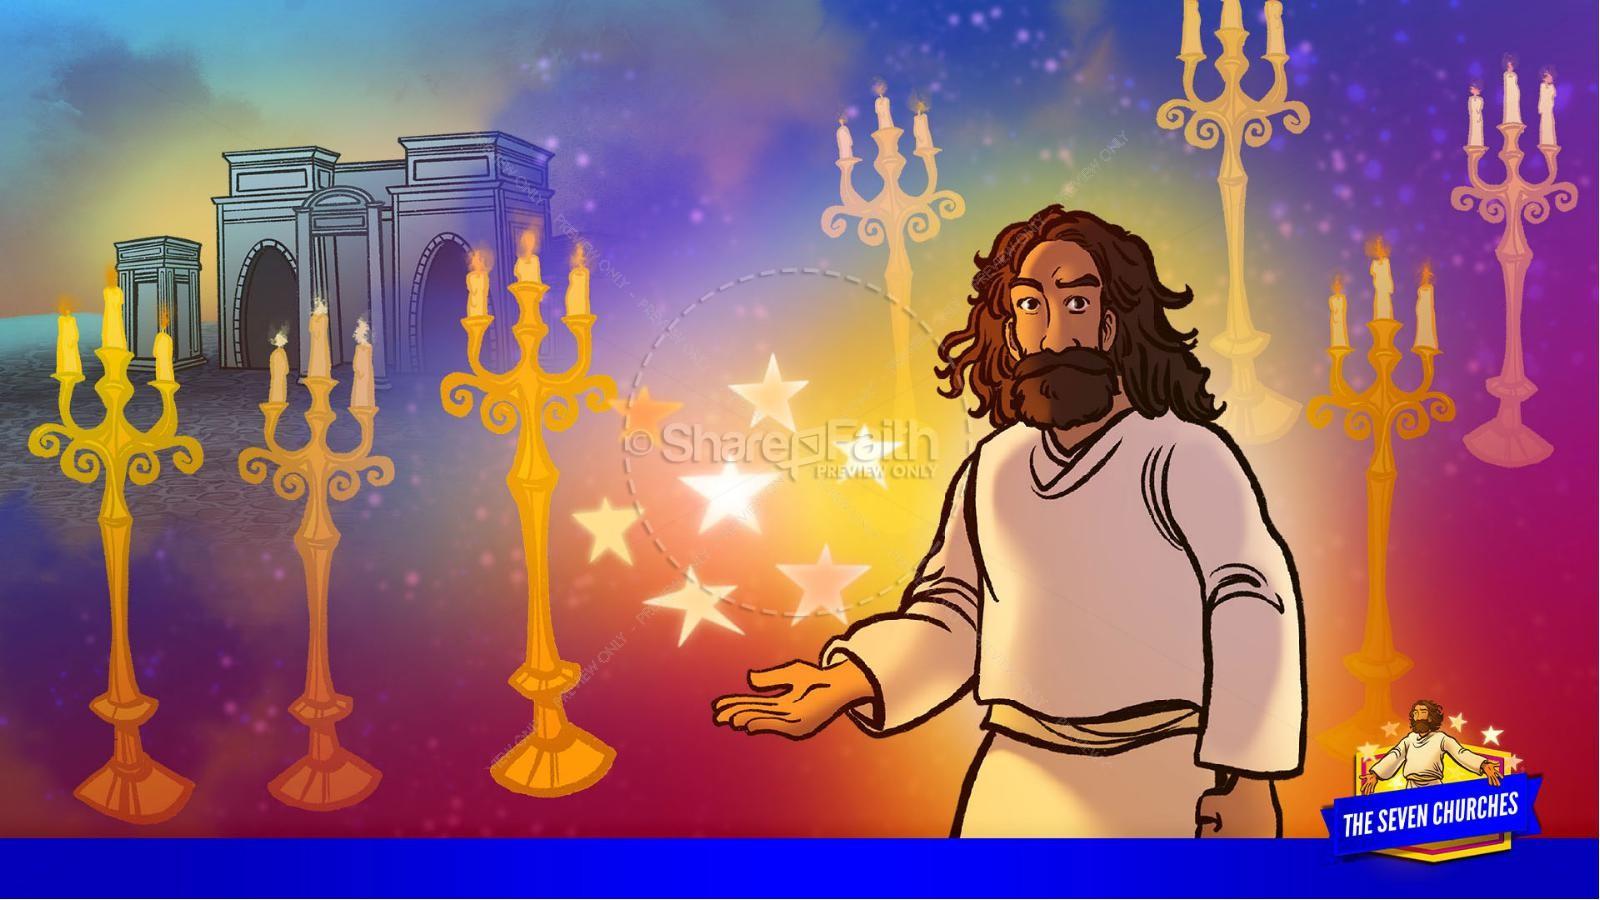 Revelation 2 3 The Seven Churches Kids Bible Story | slide 15